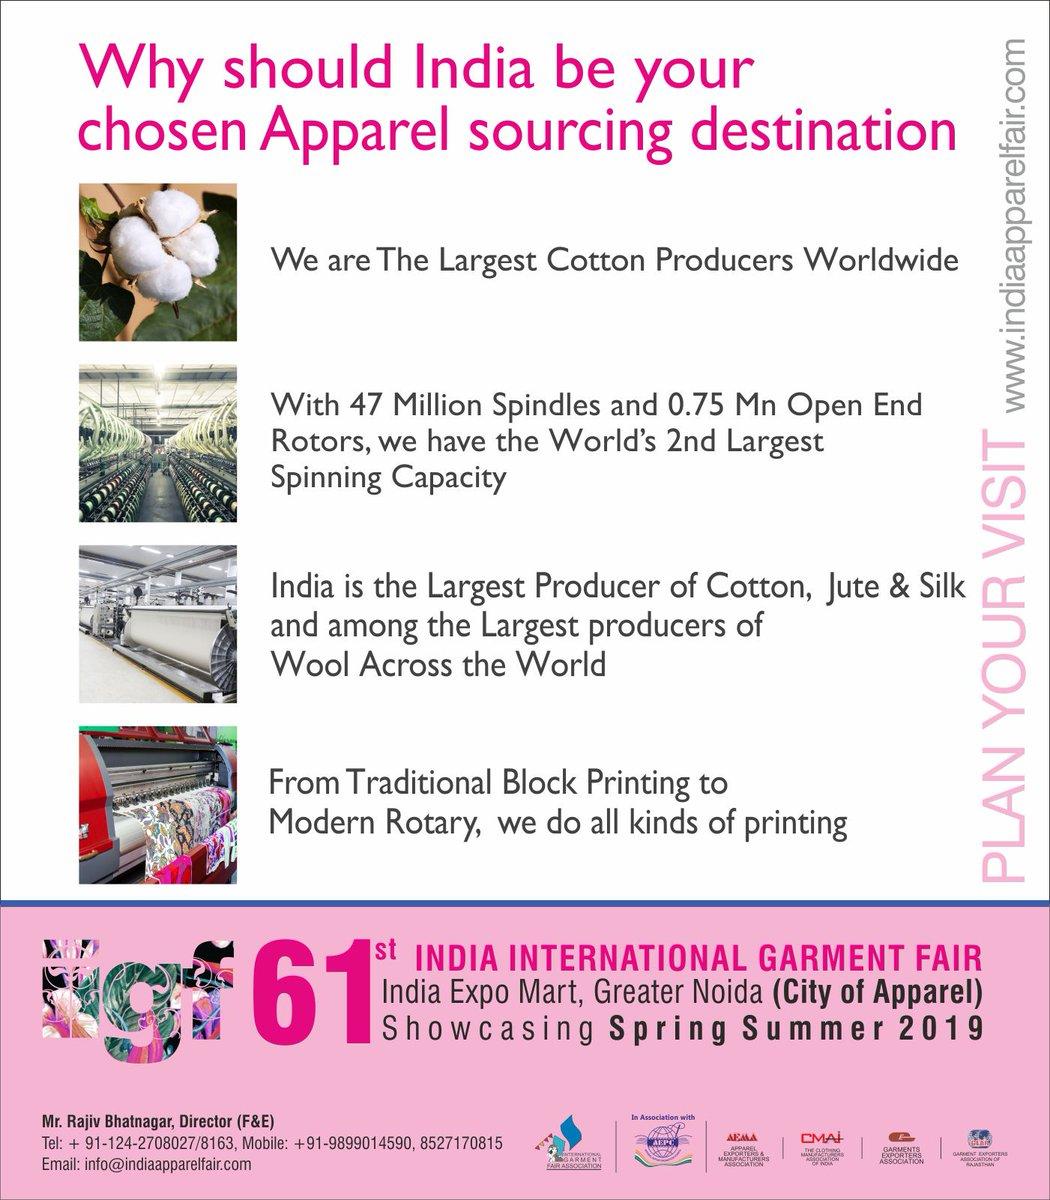 India International Garment Fair on Twitter: